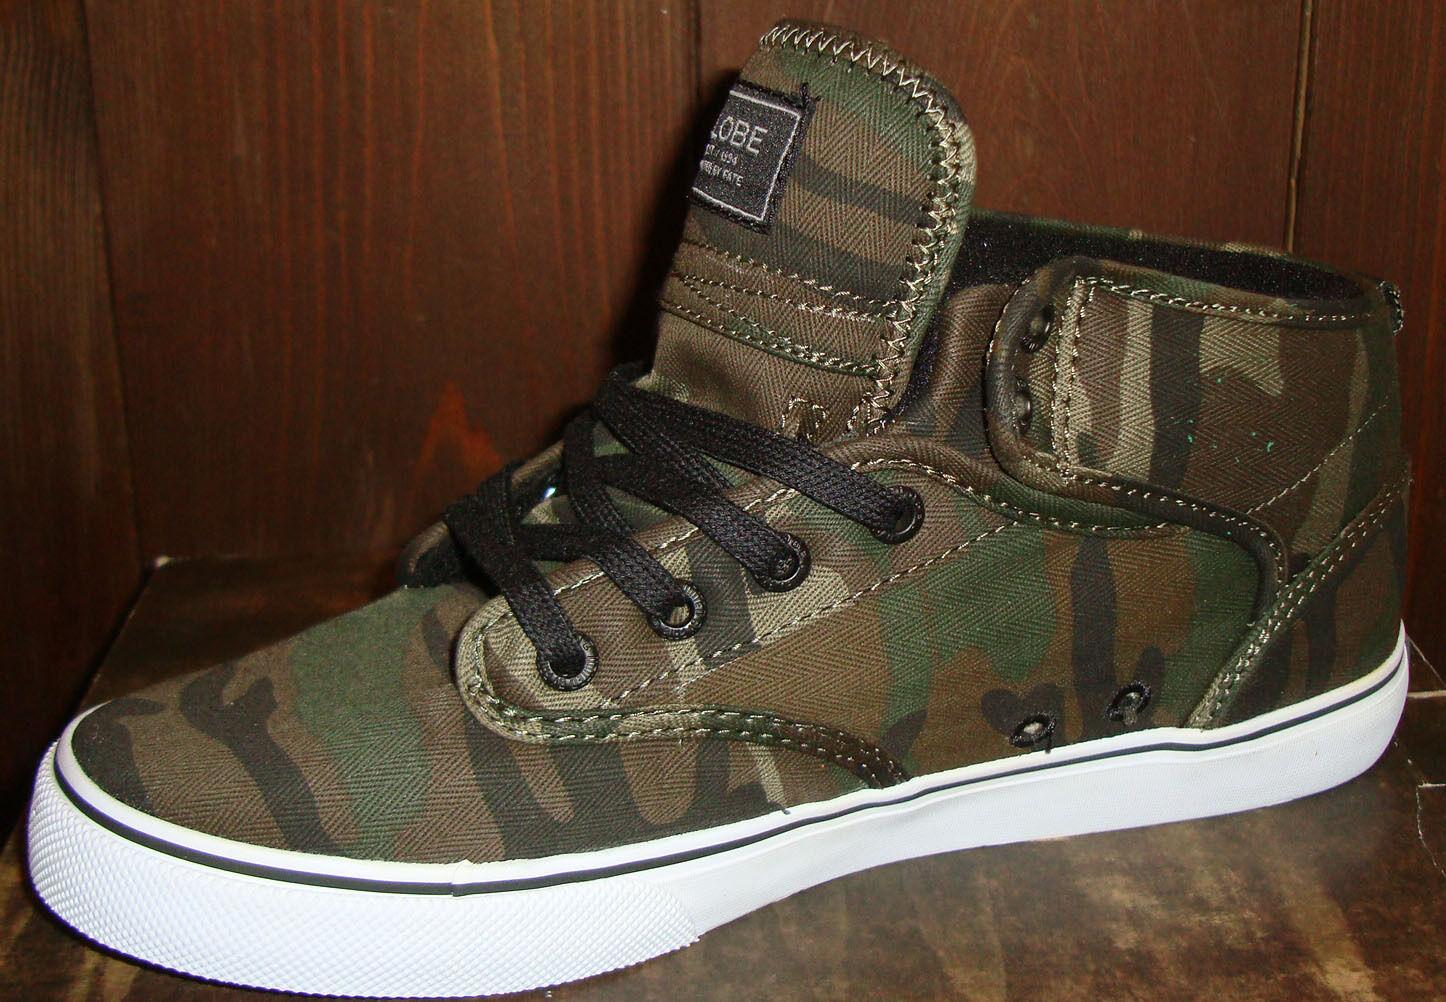 Scarpe da skateboard GLOBE Motley Mid skate street shoes green camo